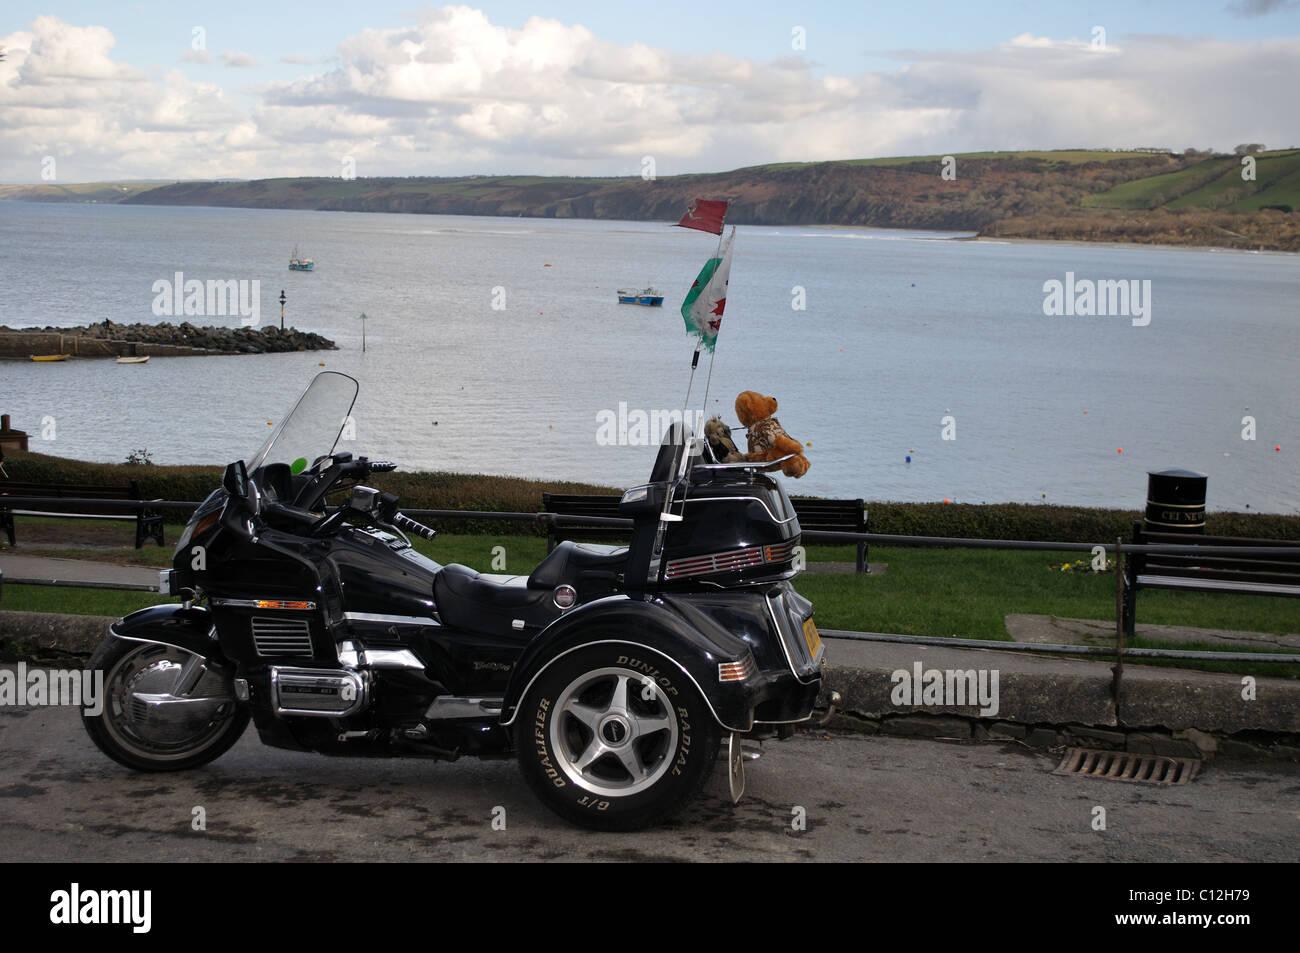 Three wheel motorbike with teddy bear on back, Newquay, Ceredigion, Wales, United Kingdom Stock Photo